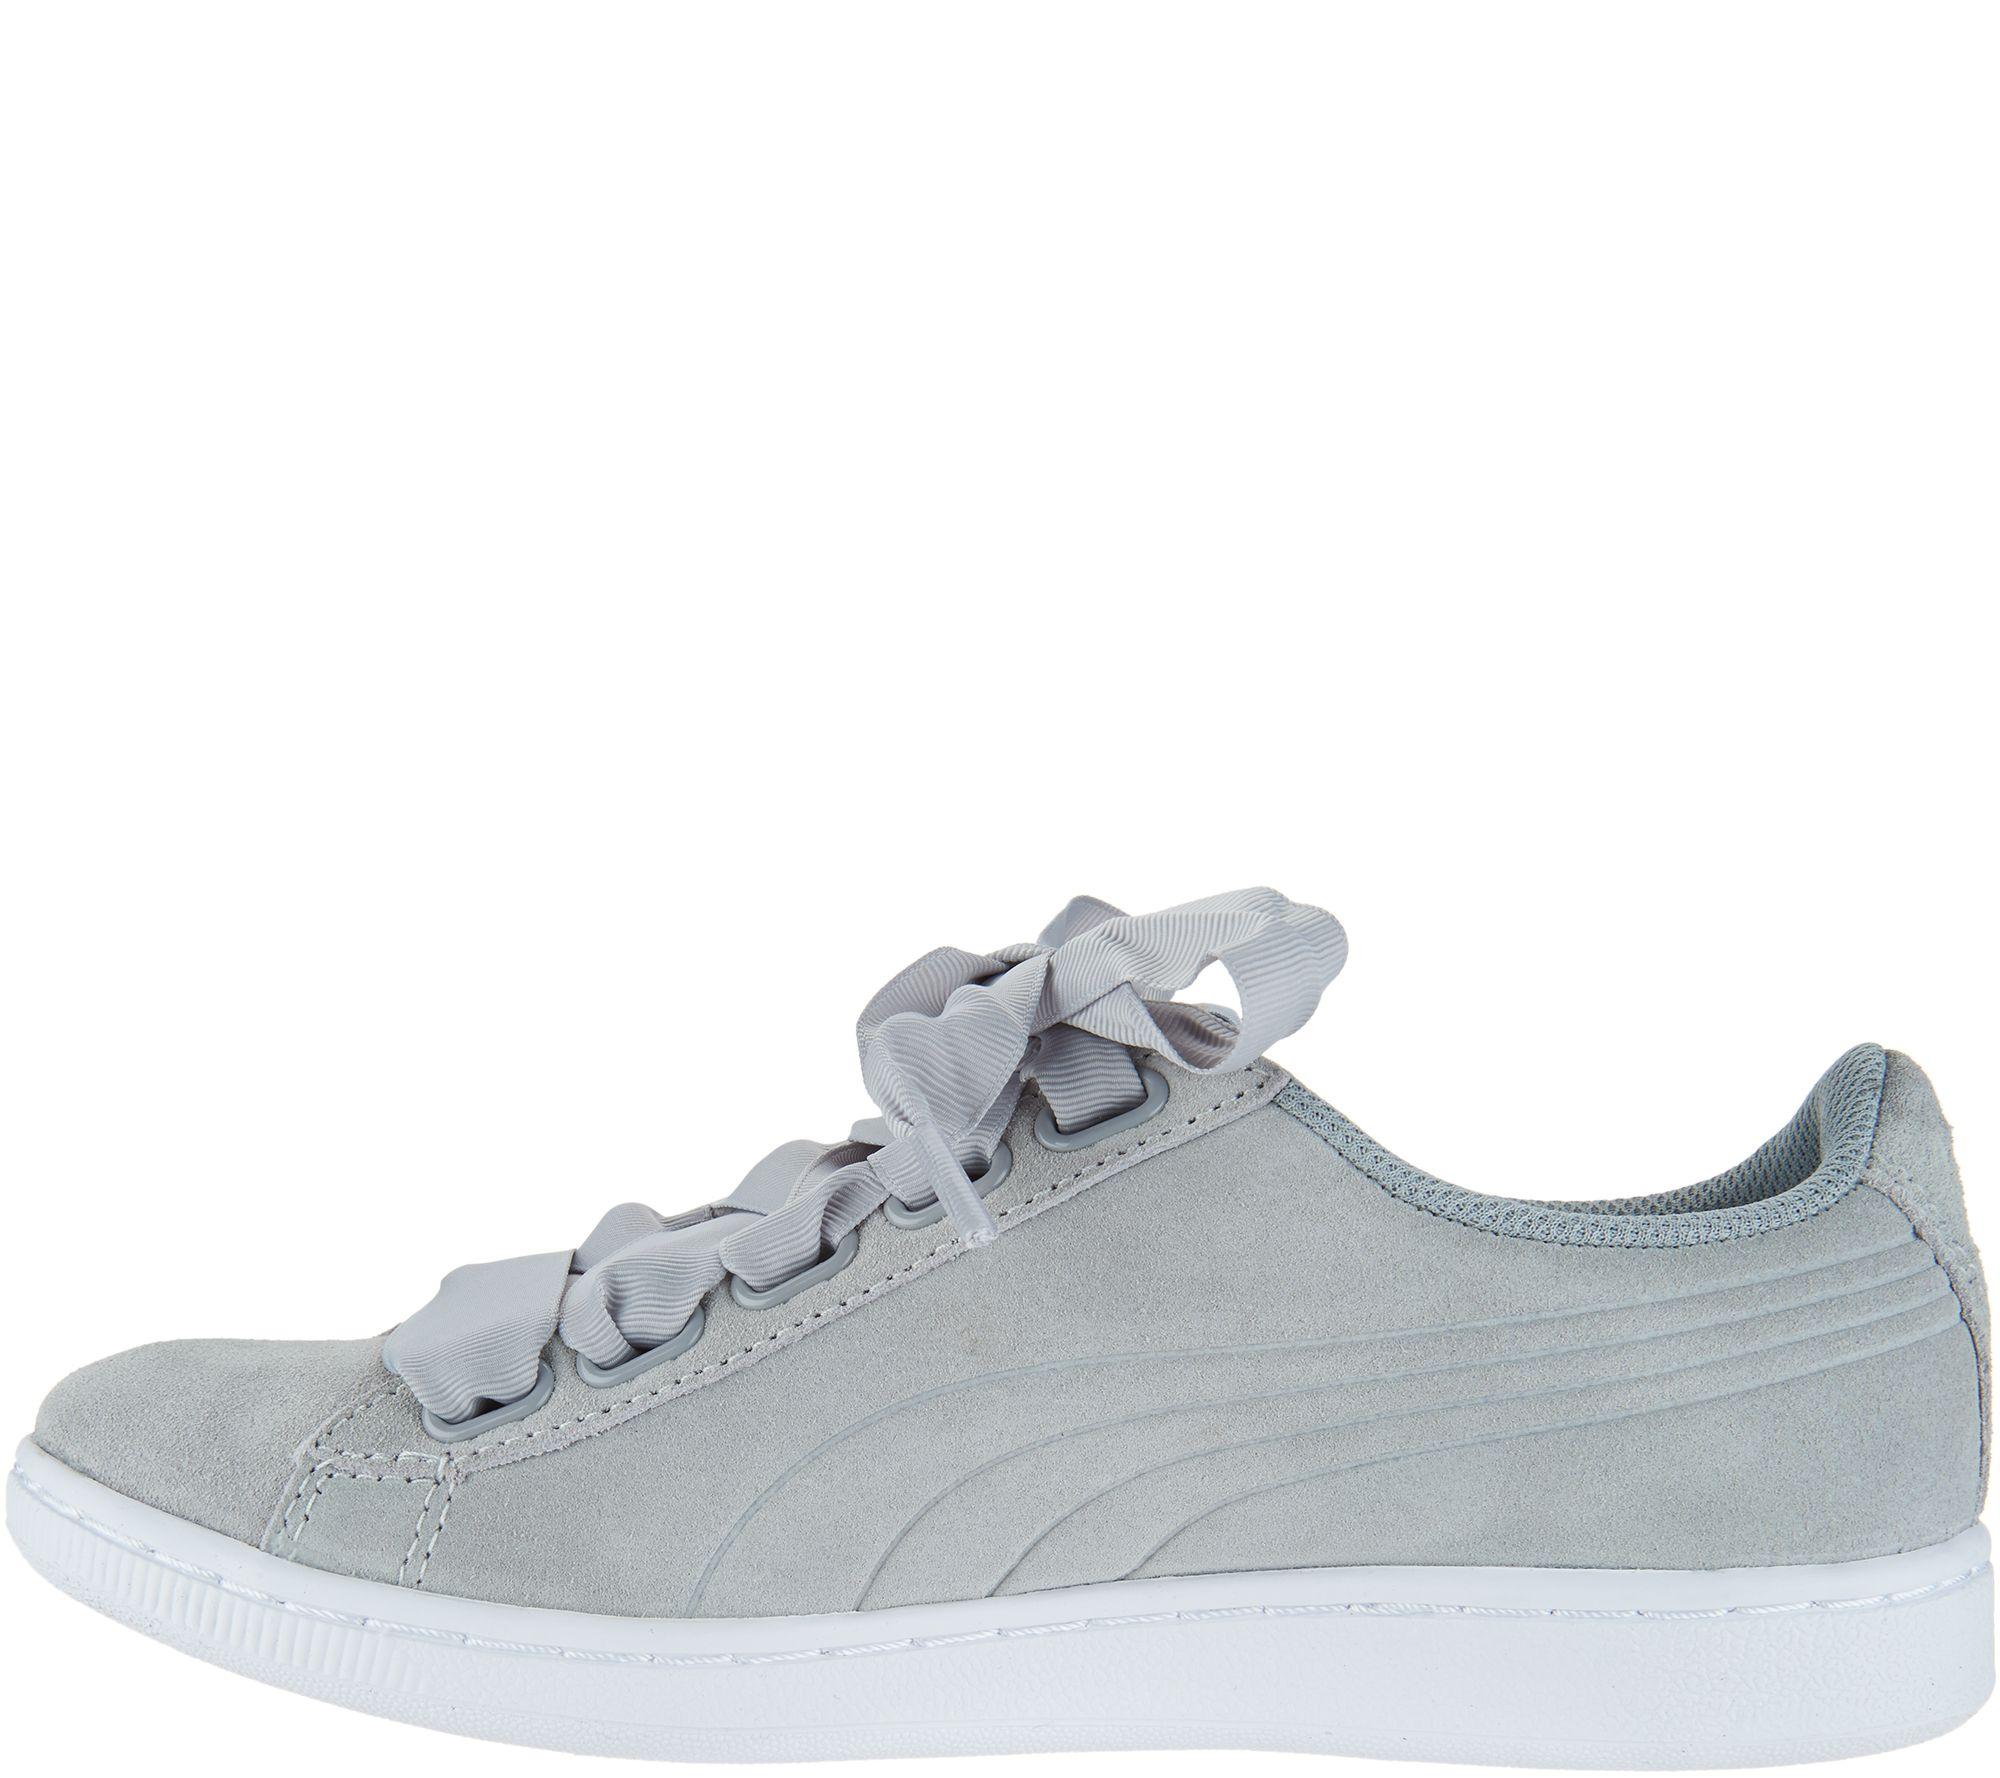 Footlocker Venta Barata D.A.T.E. gemstone bow-tie sneakers - White Venta Barata En Línea Salida Fiable RxzzgAf4M